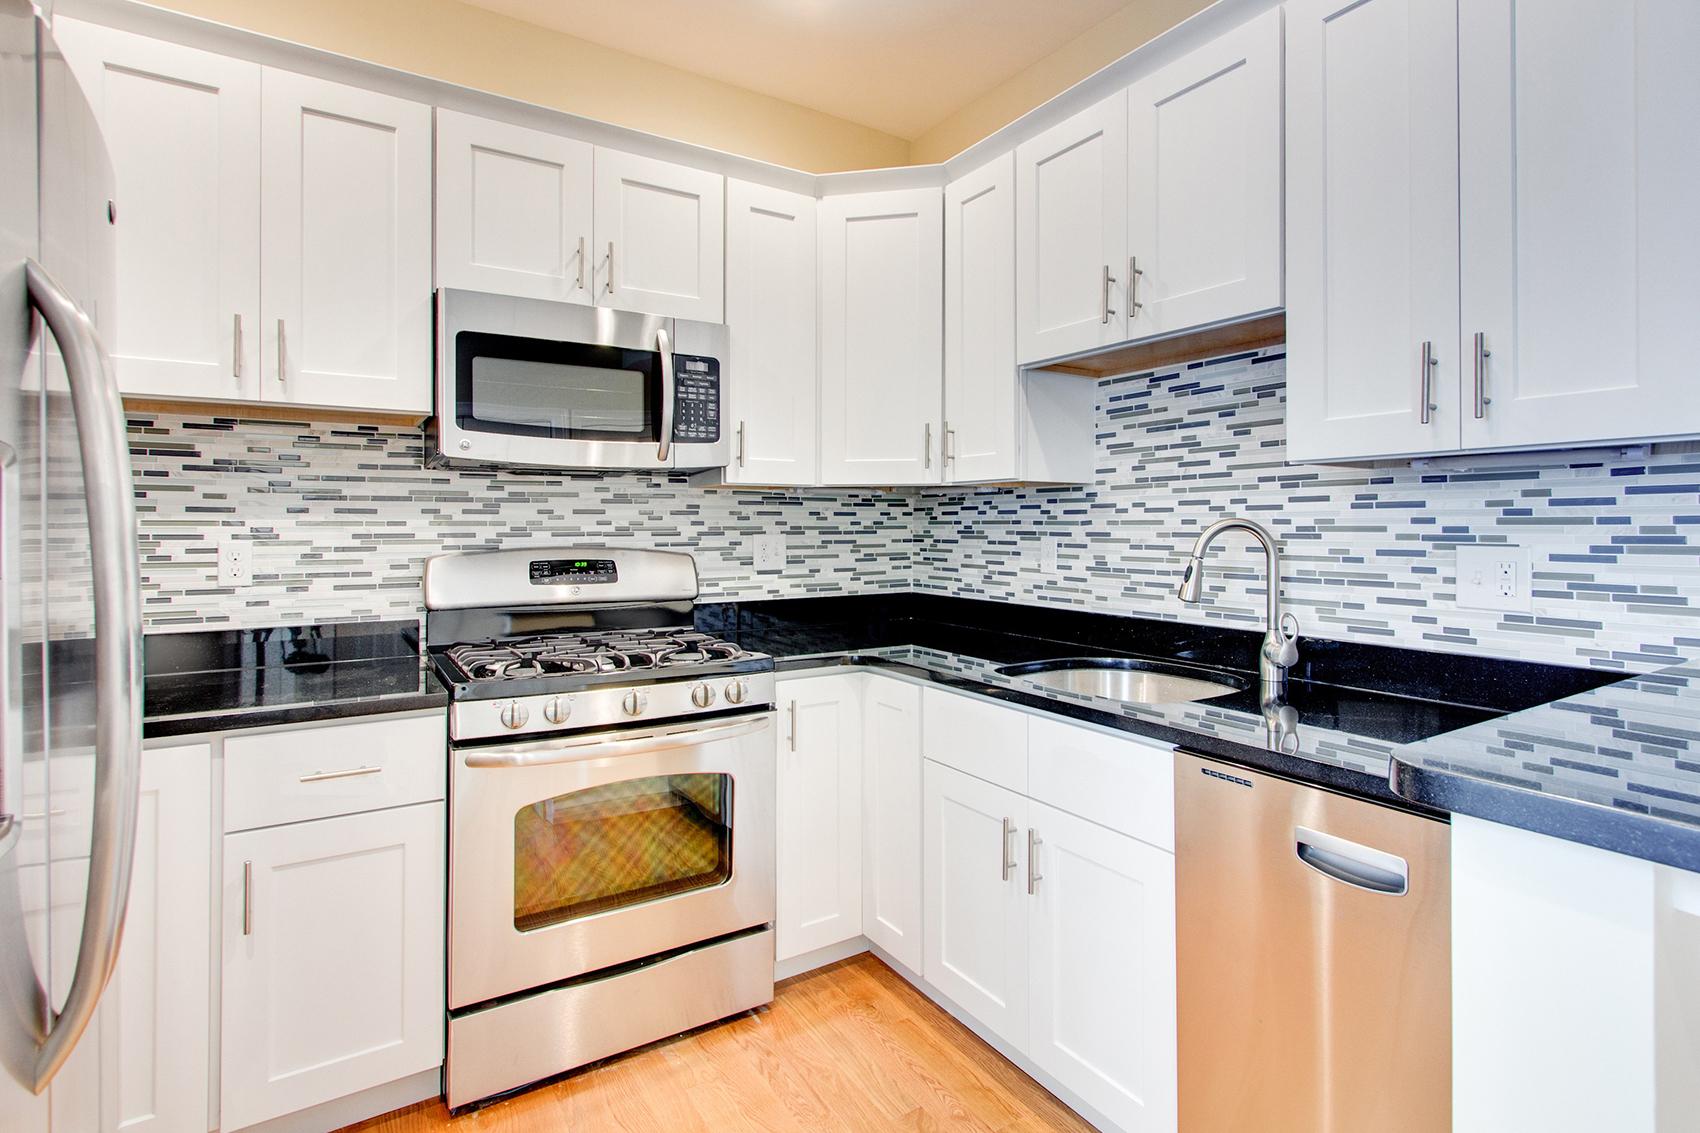 1 Day Kitchen & Bath - #1 source of granite countertops ...